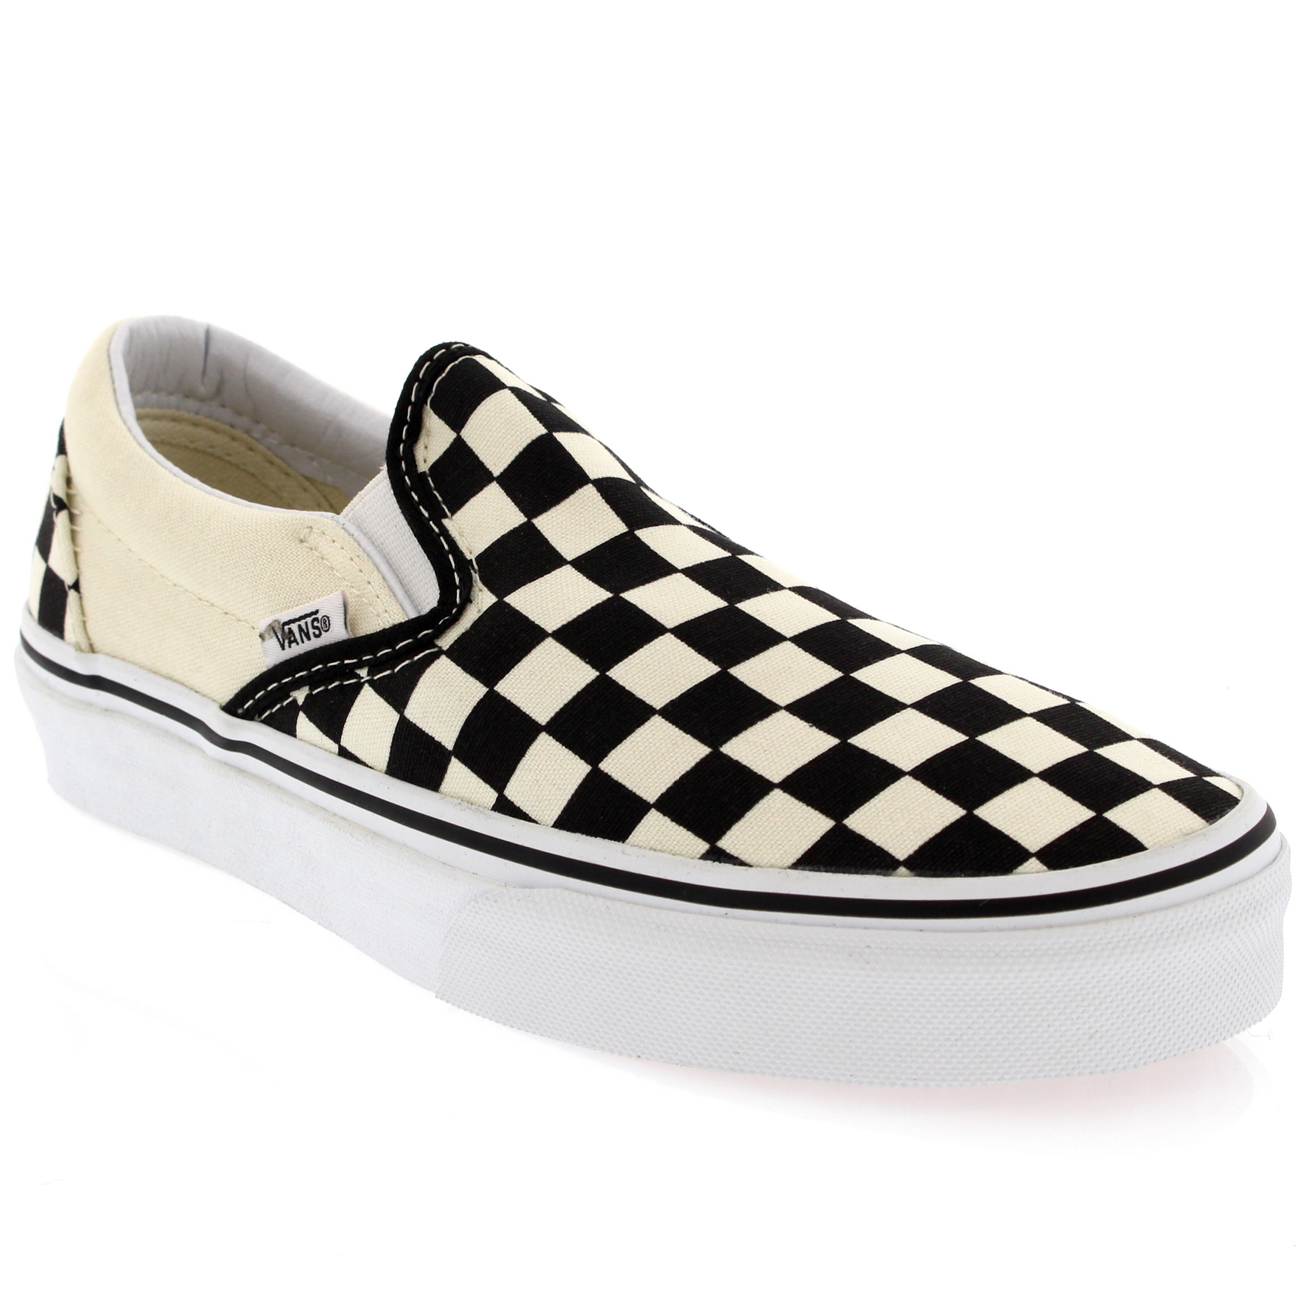 Womens Vans Classic Slip Canvas Slip On Sneakers Shoe ...